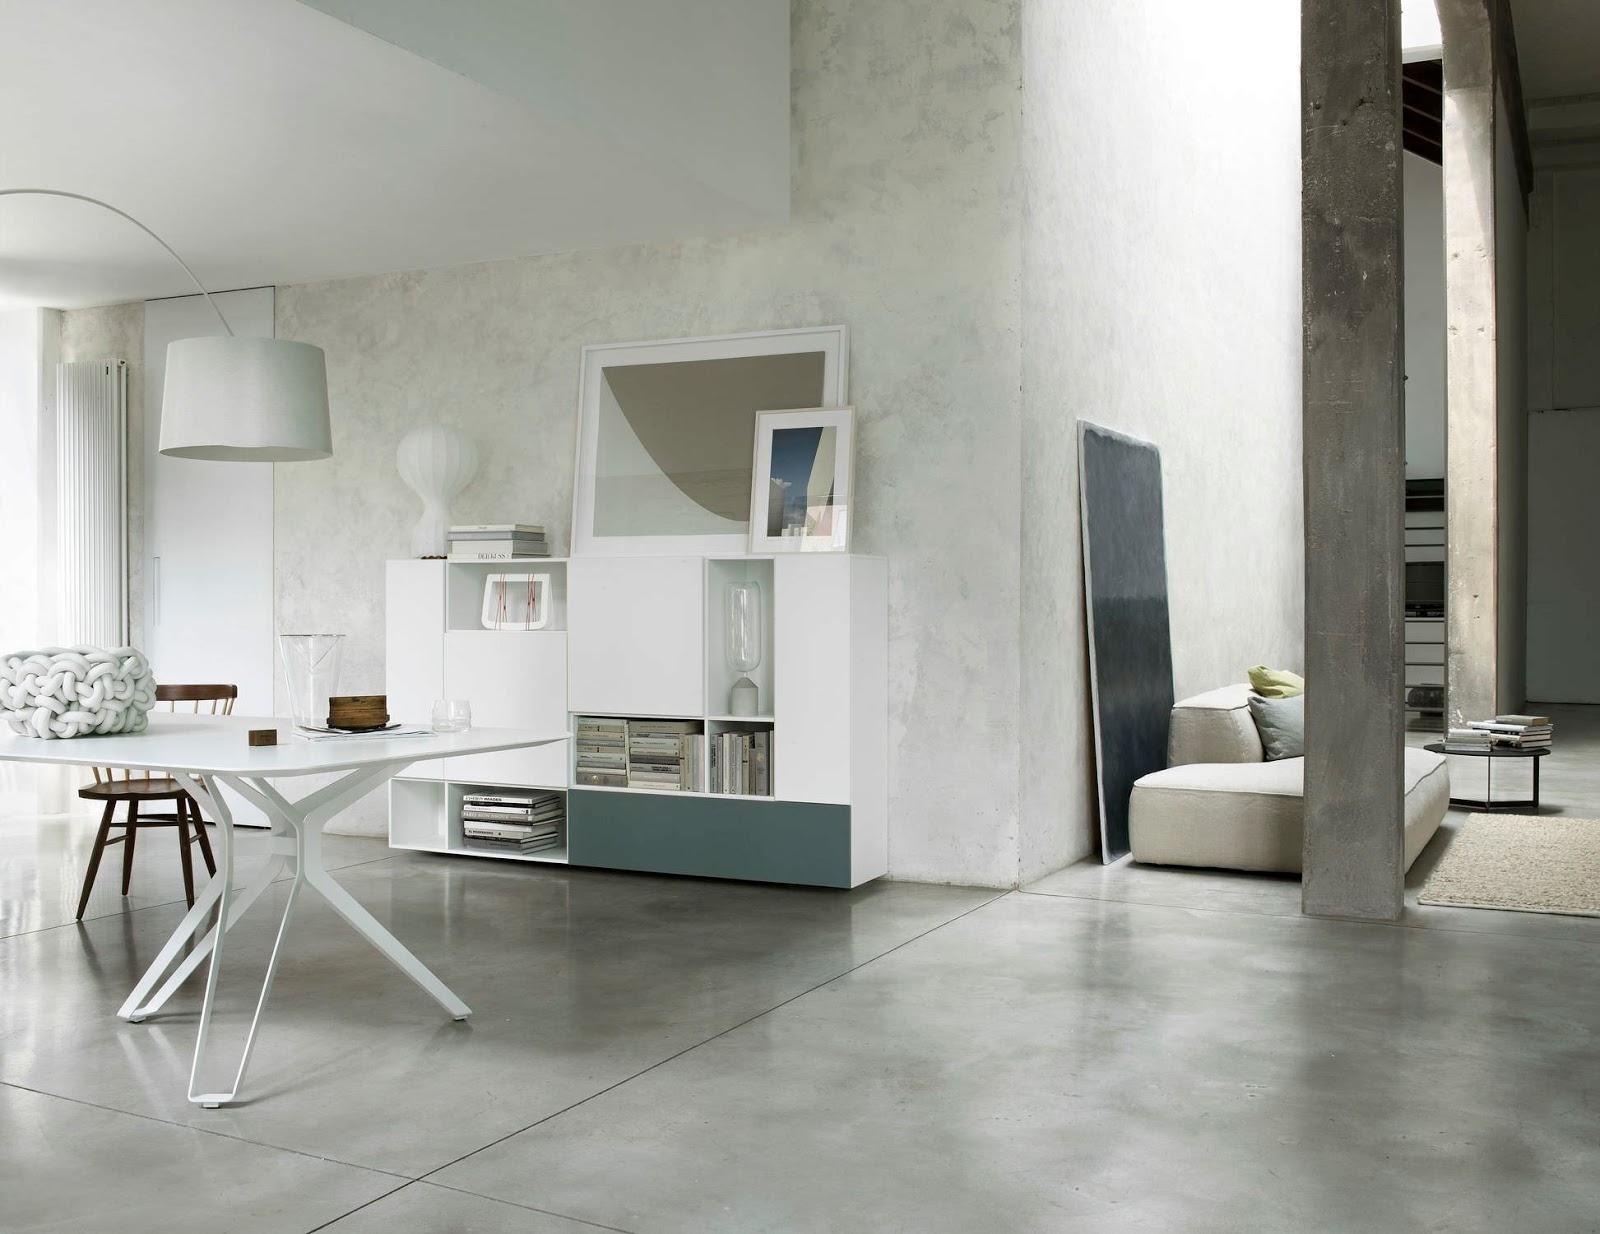 15 Model Keramik Lantai Rumah yang Elegan